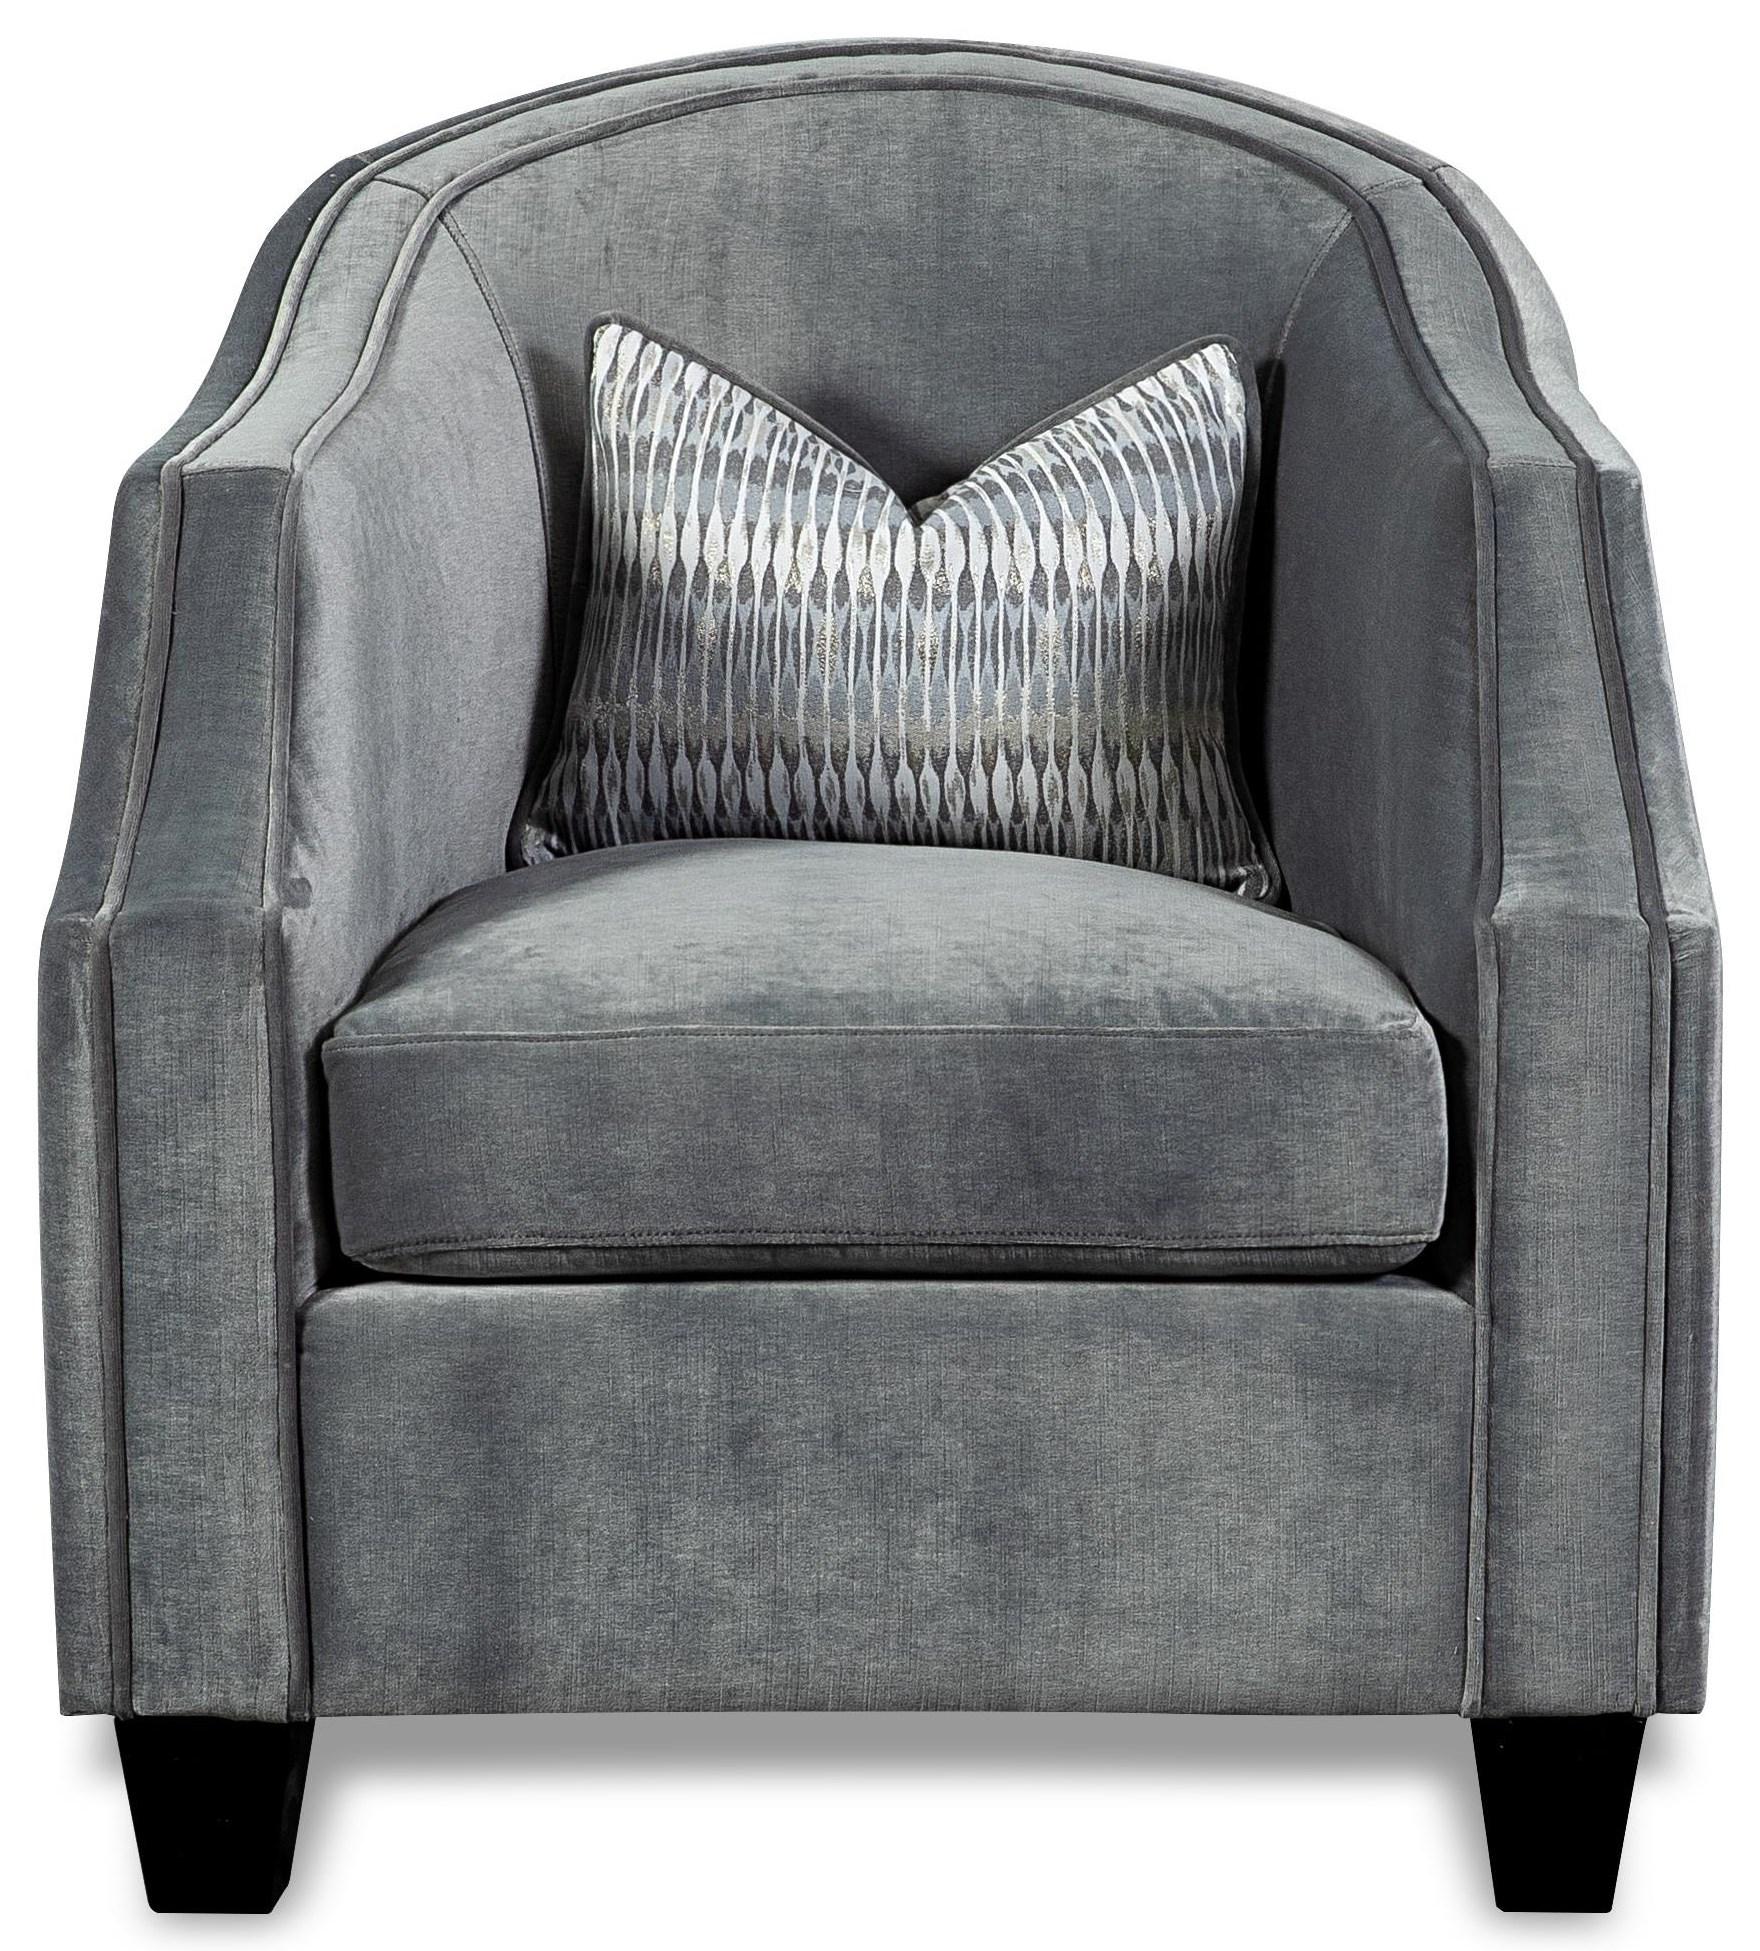 Astoria Astoria Chair by Aria Designs at Morris Home